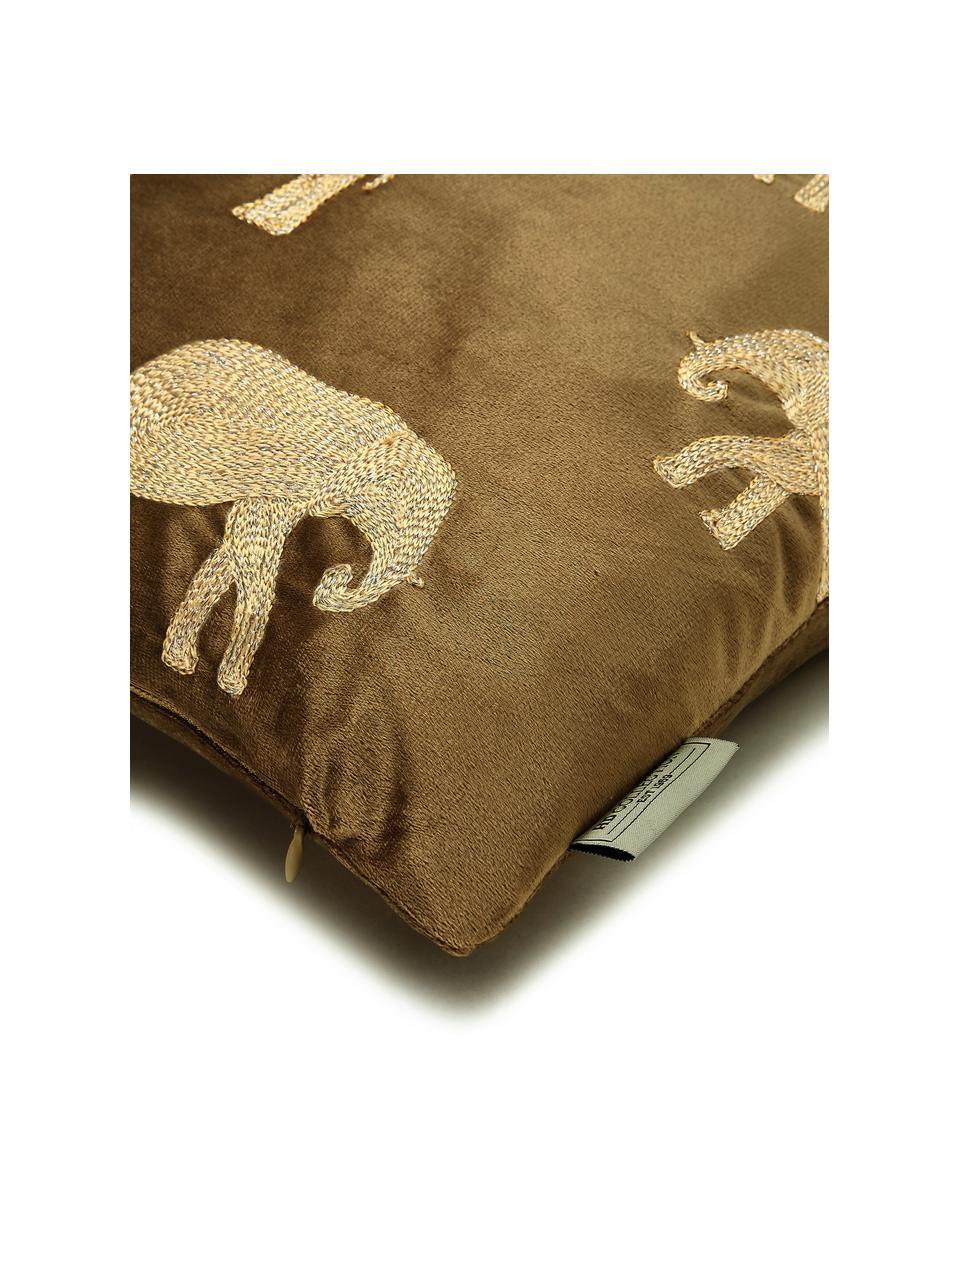 Goudkleurig geborduurd fluwelen kussen Elephant in bruin, met vulling, 100% fluweel (polyester), Bruin, goudkleurig, 45 x 45 cm